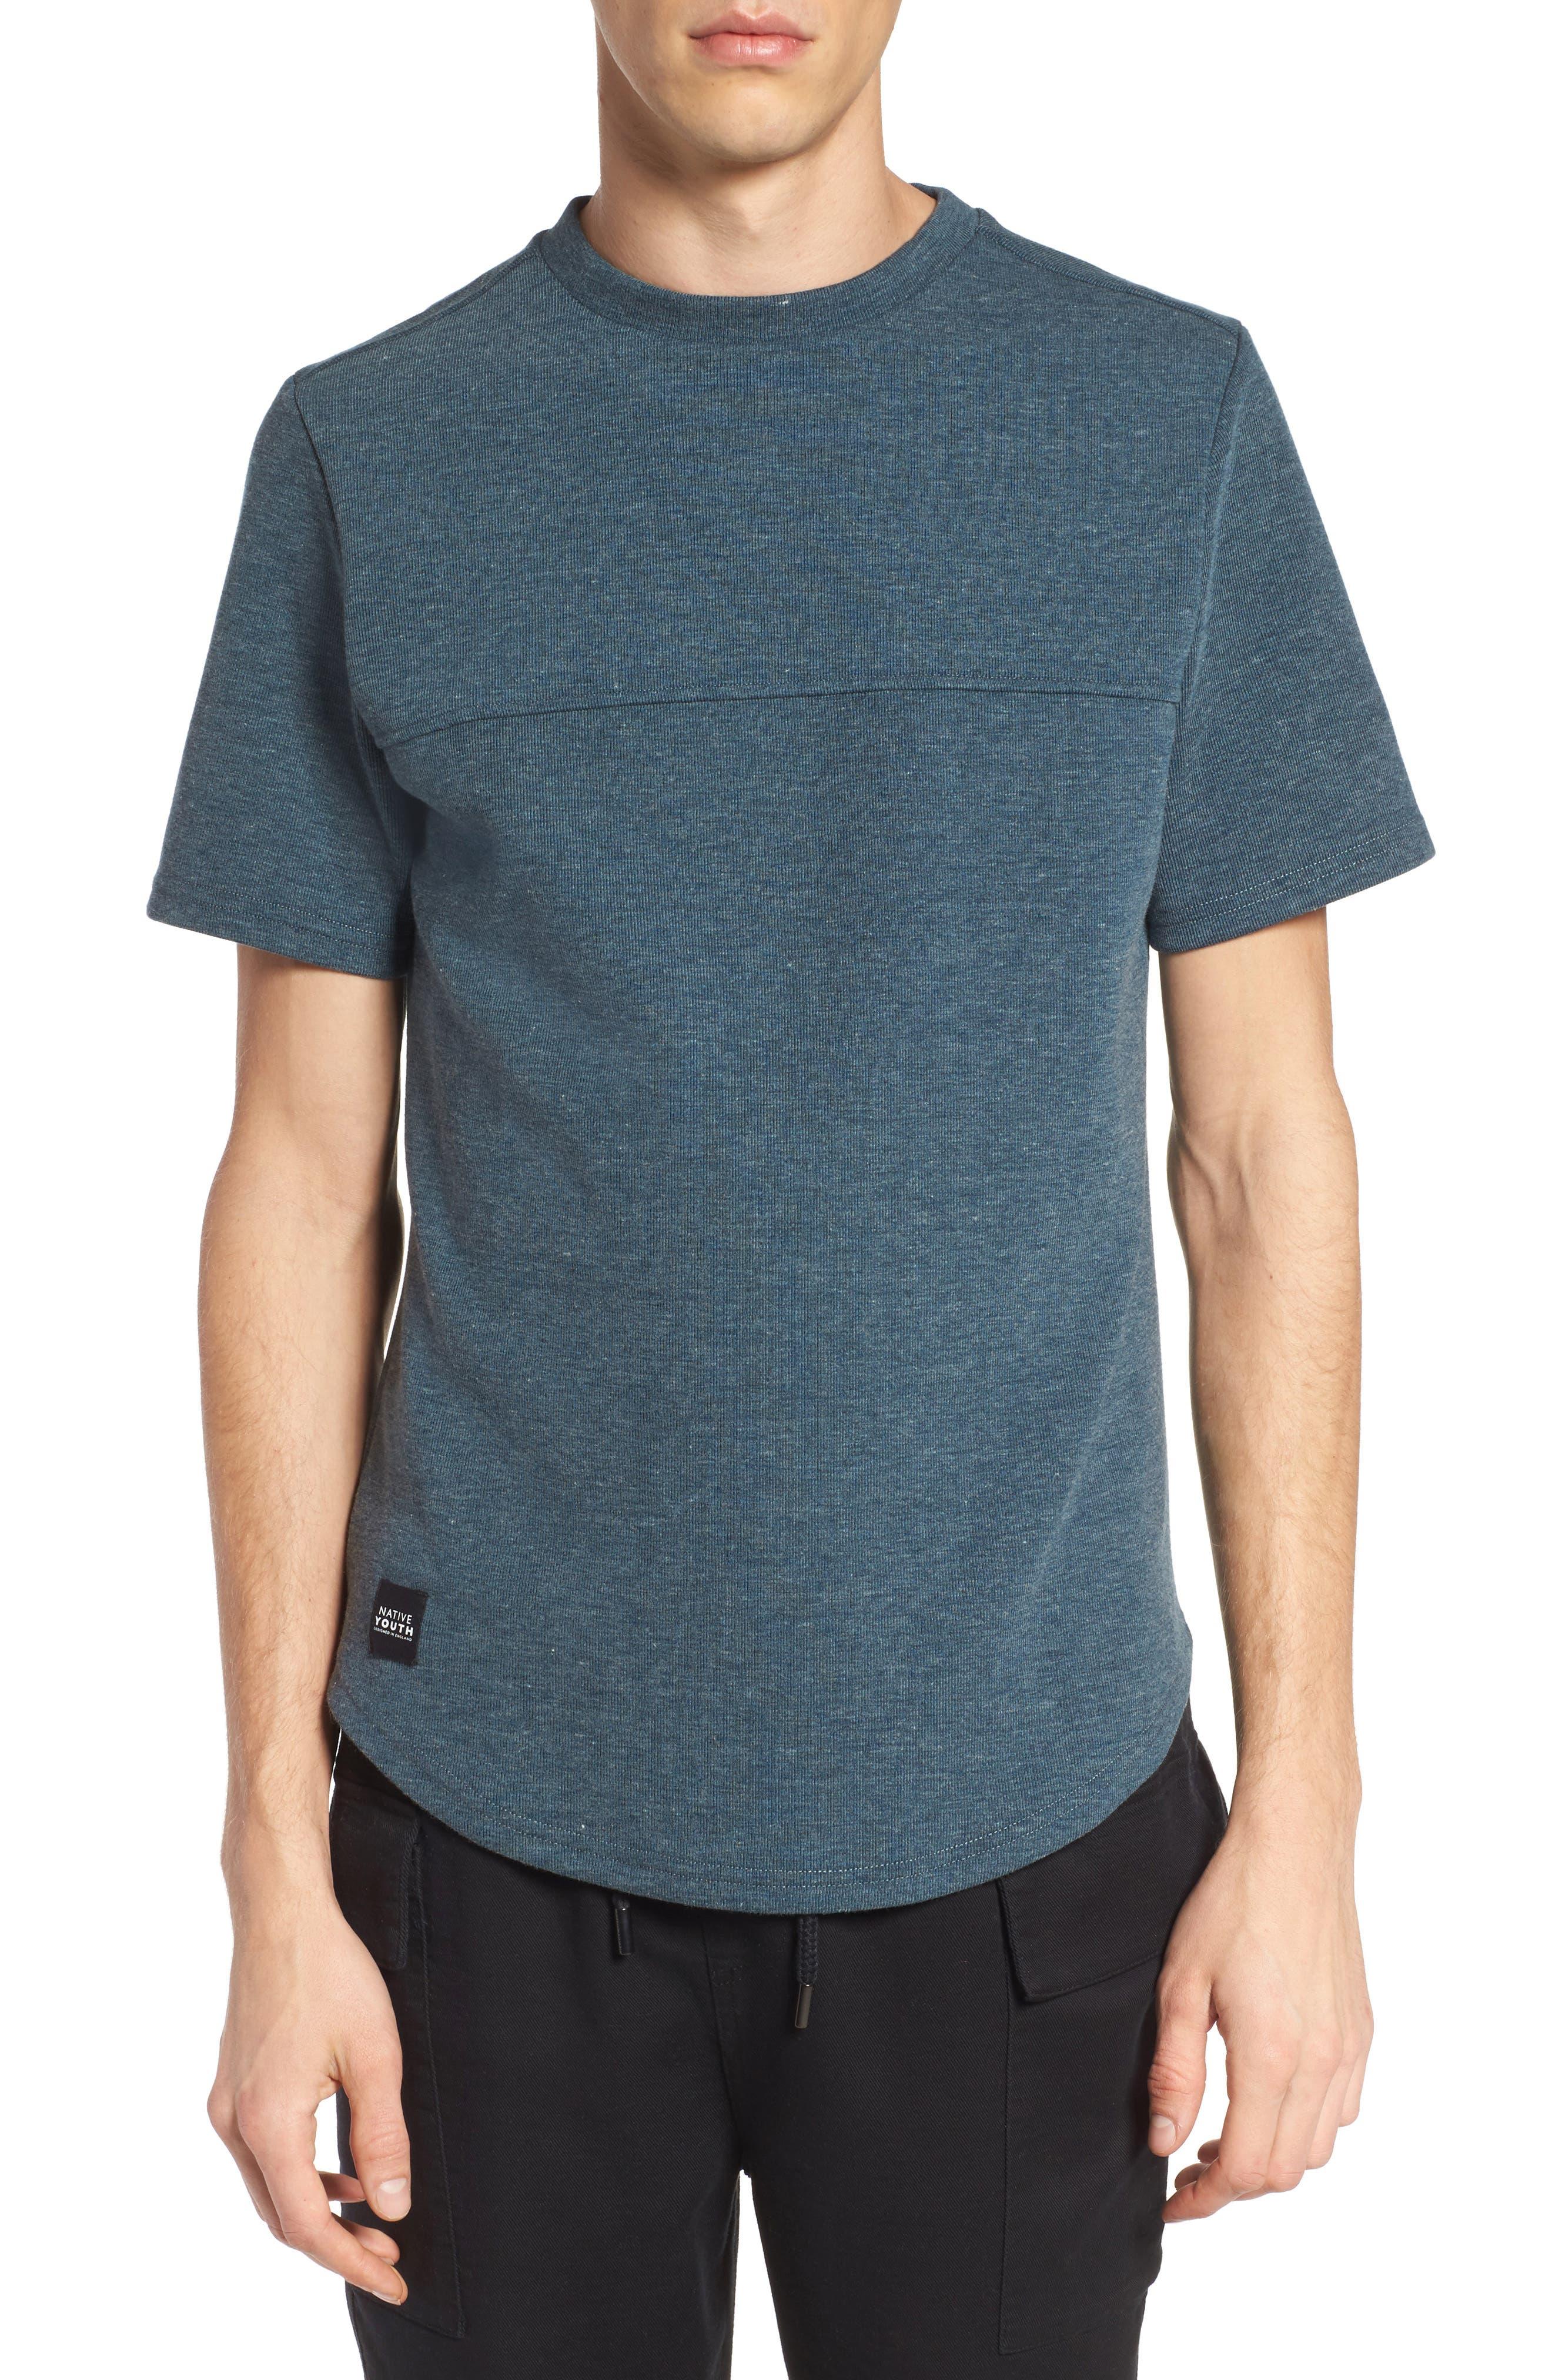 Onyx T-Shirt,                         Main,                         color, Teal